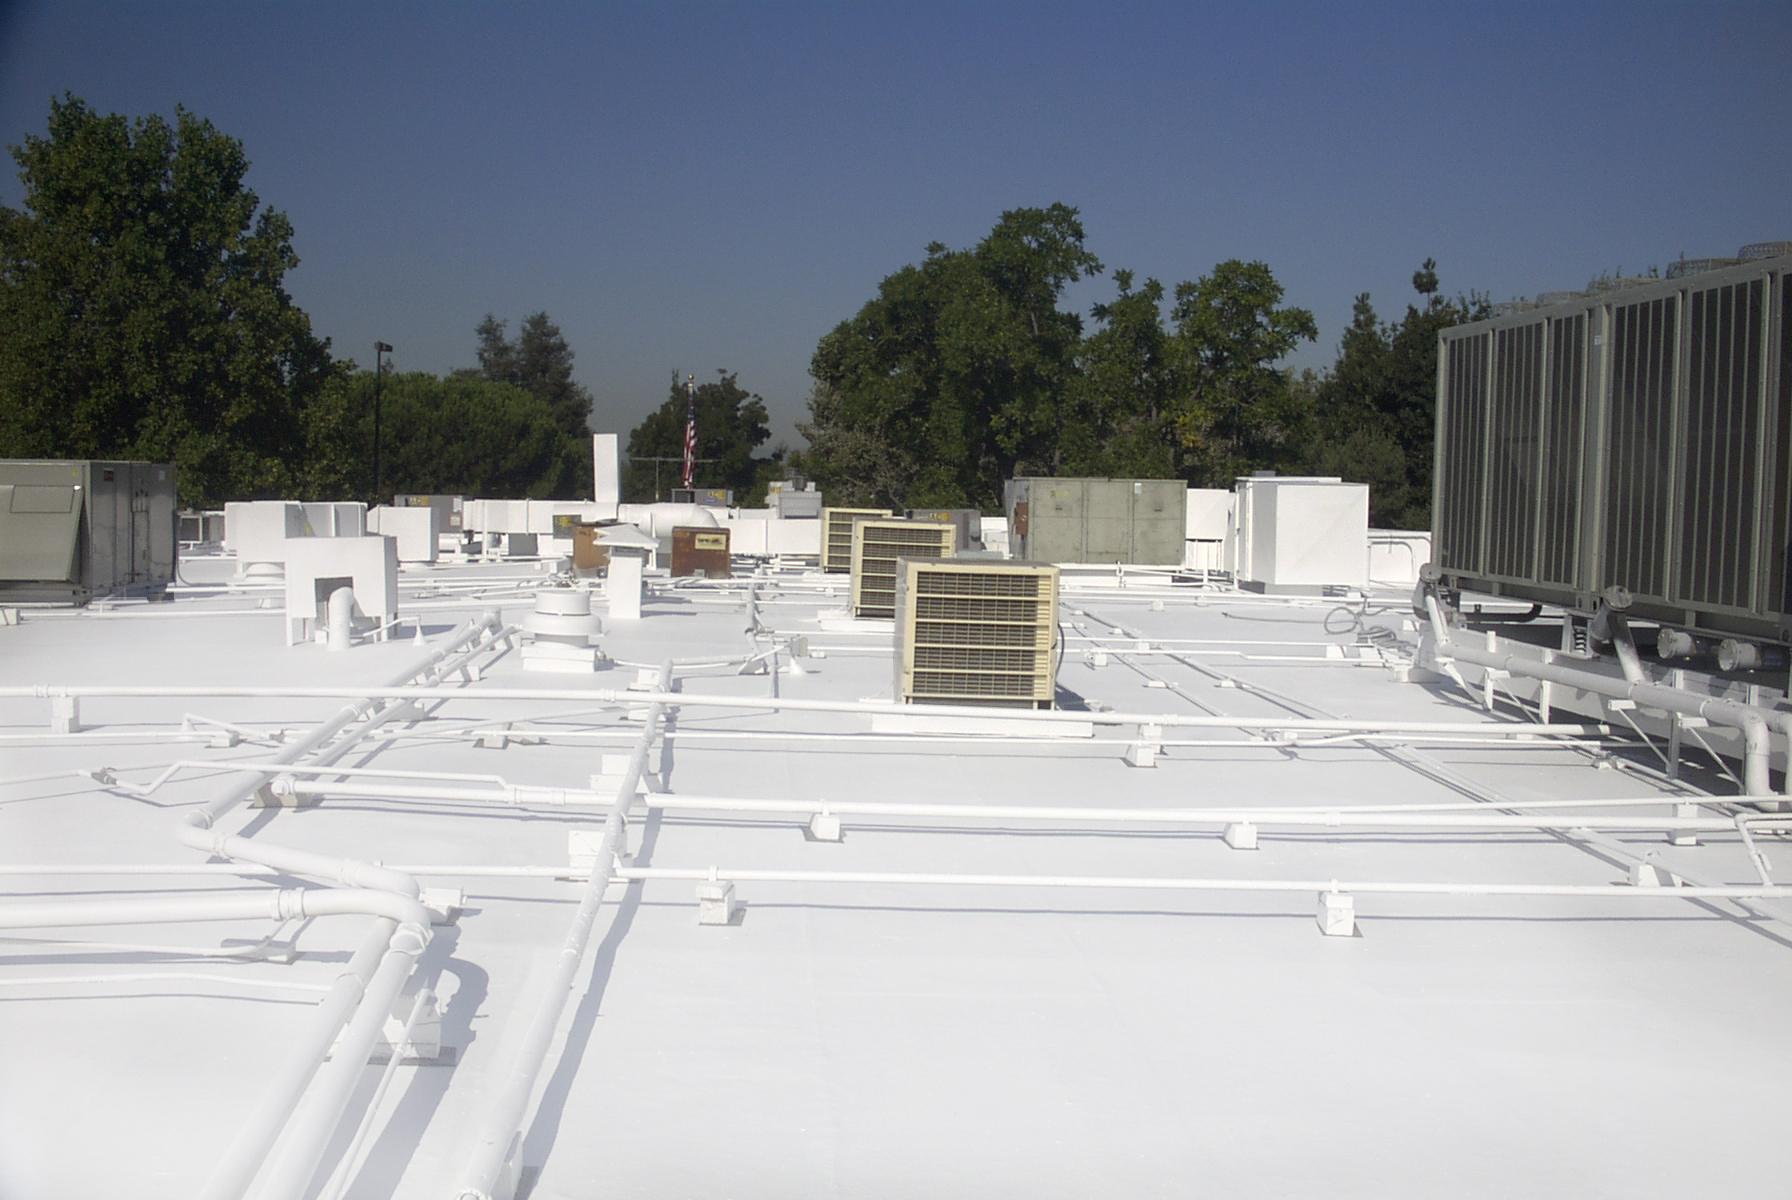 Elastomeric Roof Coatings Waterproof Around Roof Equipment With No Hassle